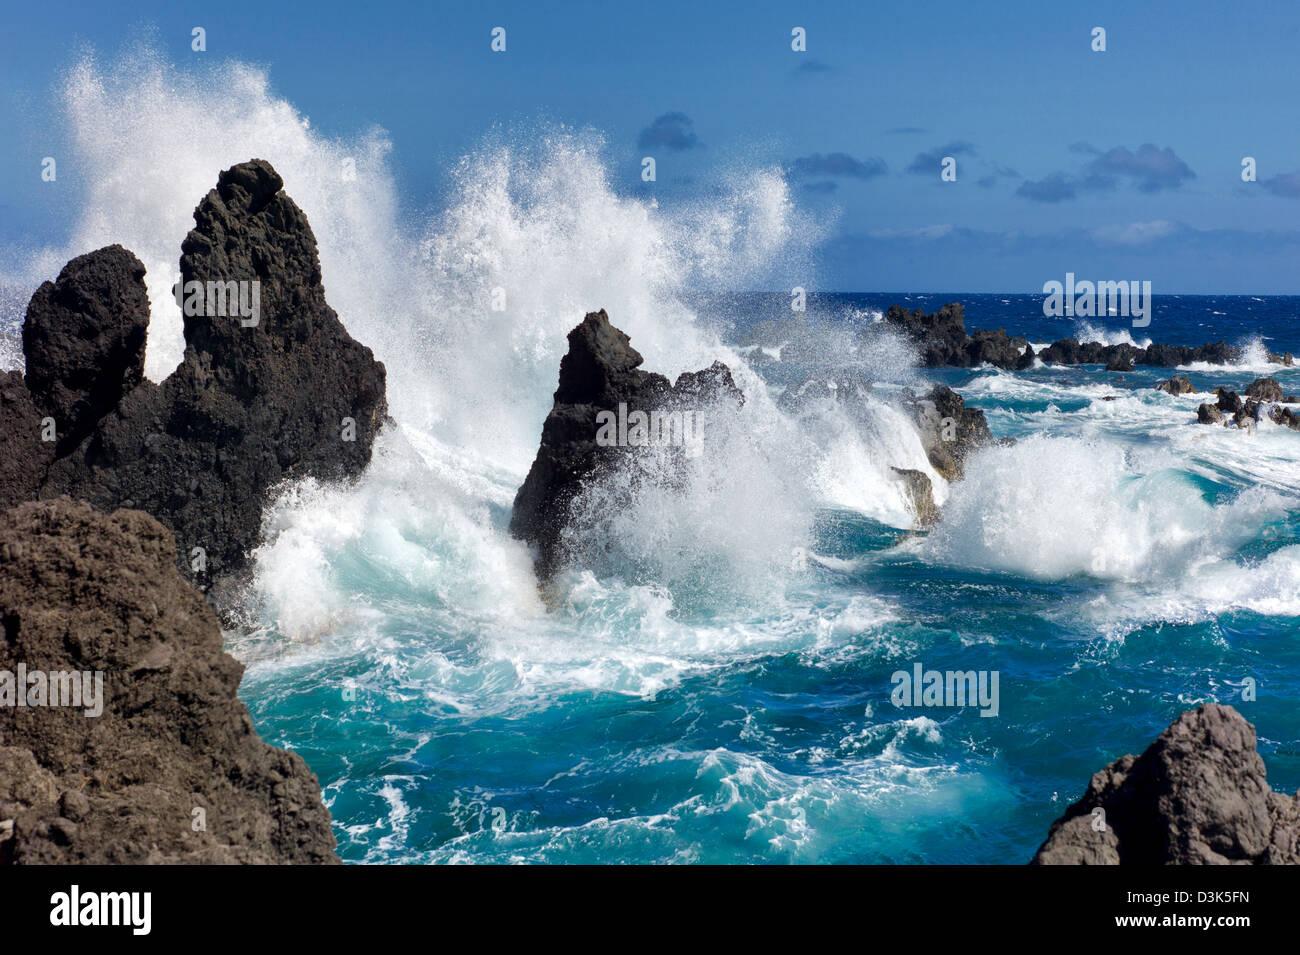 Waves crashing on volcanic rocks. Laupahoehoe Point Beach Park. Hawaii, the big Island. - Stock Image